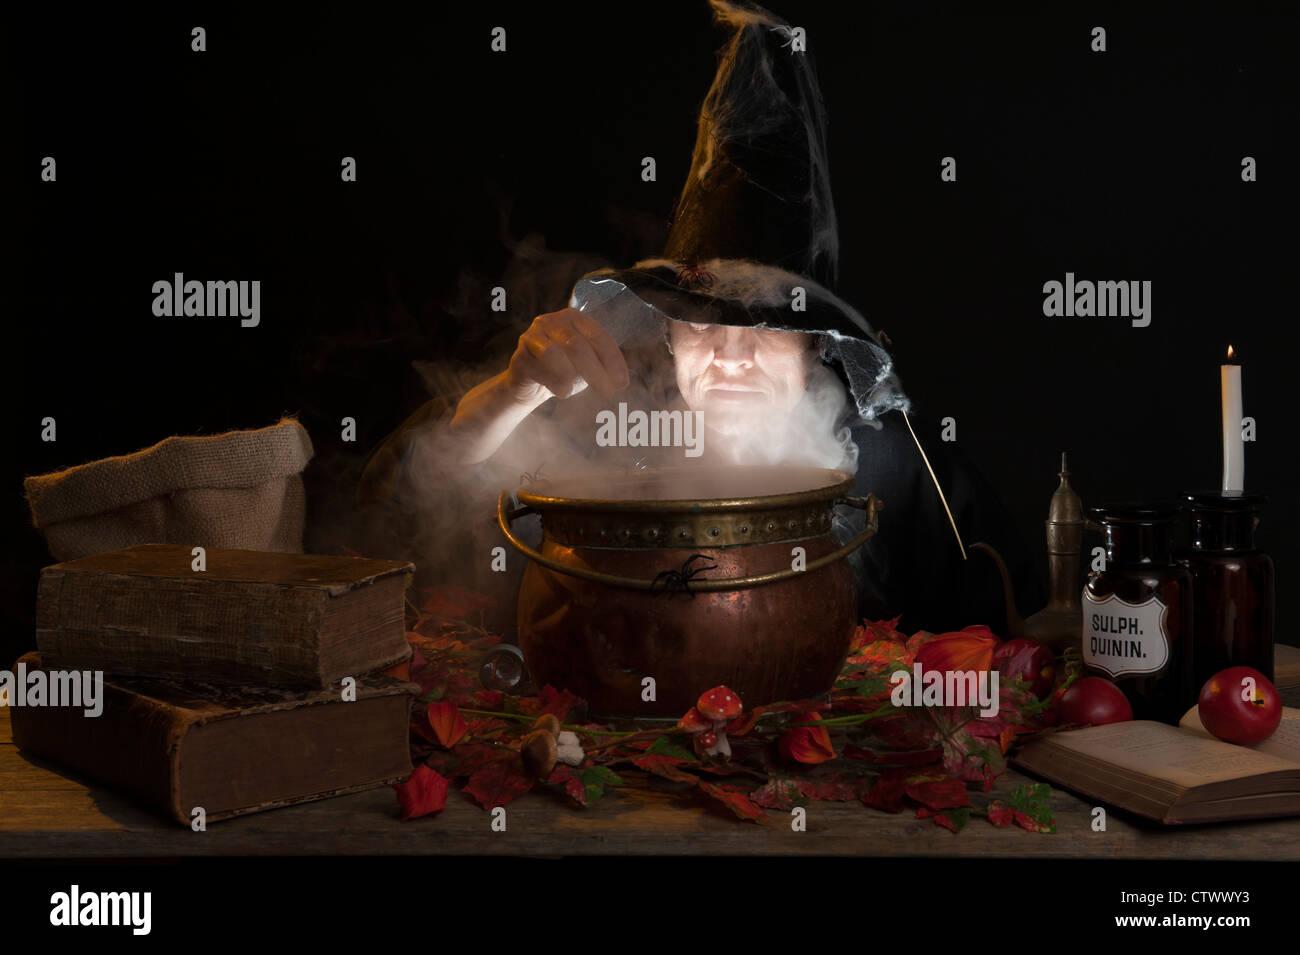 Witch Cauldron Smoke Stockfotos & Witch Cauldron Smoke Bilder ...